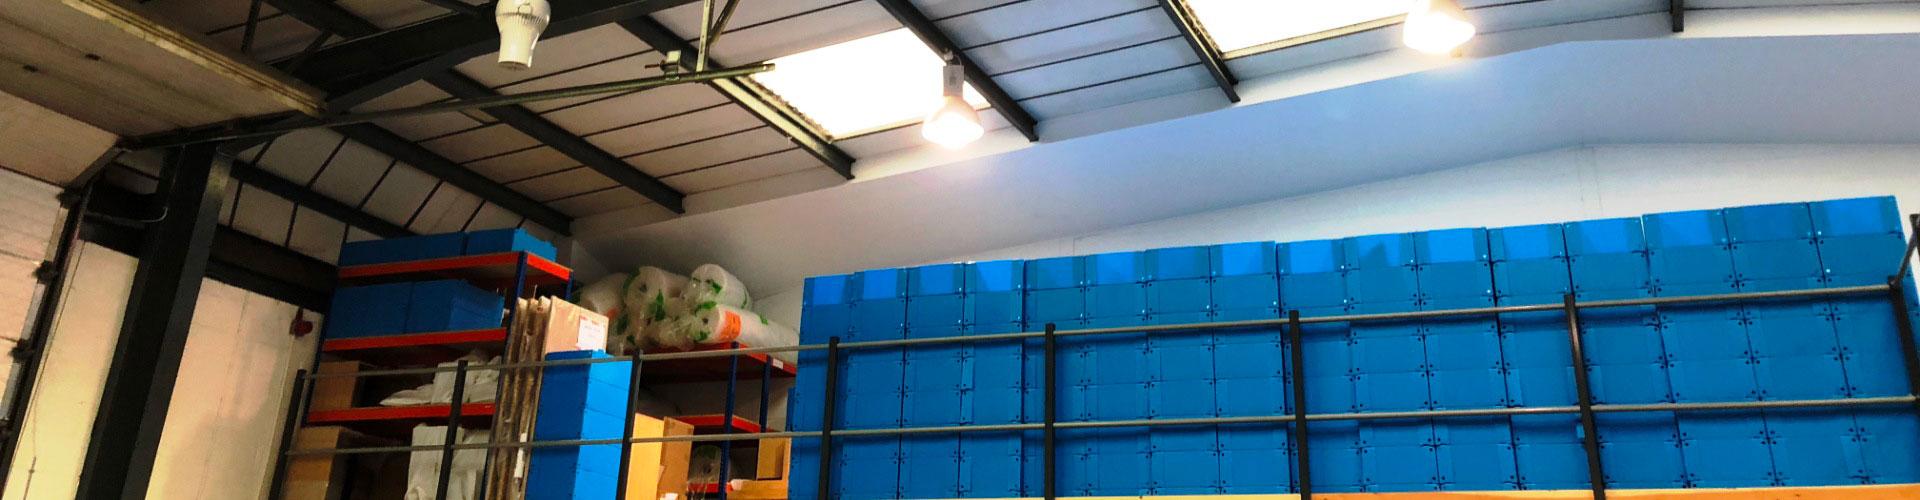 Destratification Fan System Warehouses Slider 3